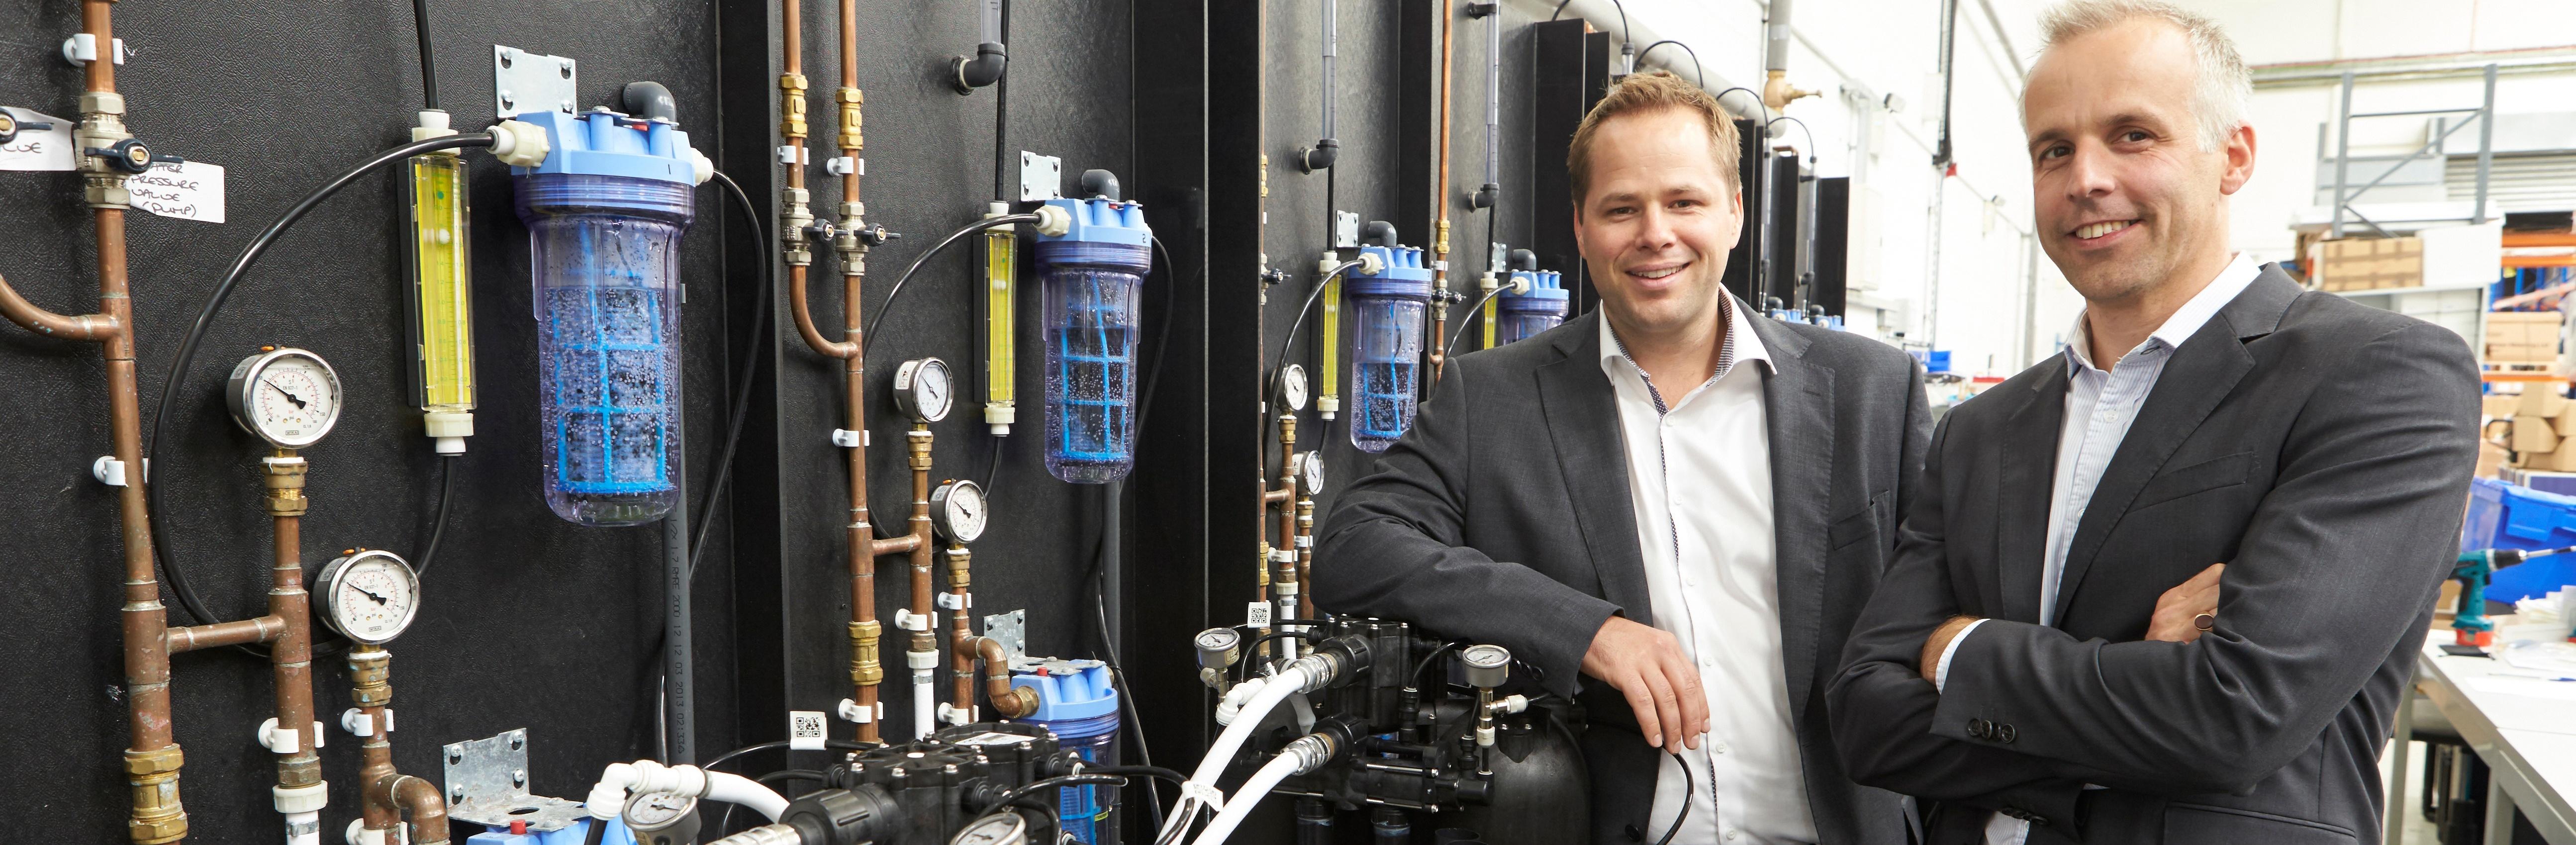 Harvey Water Softeners